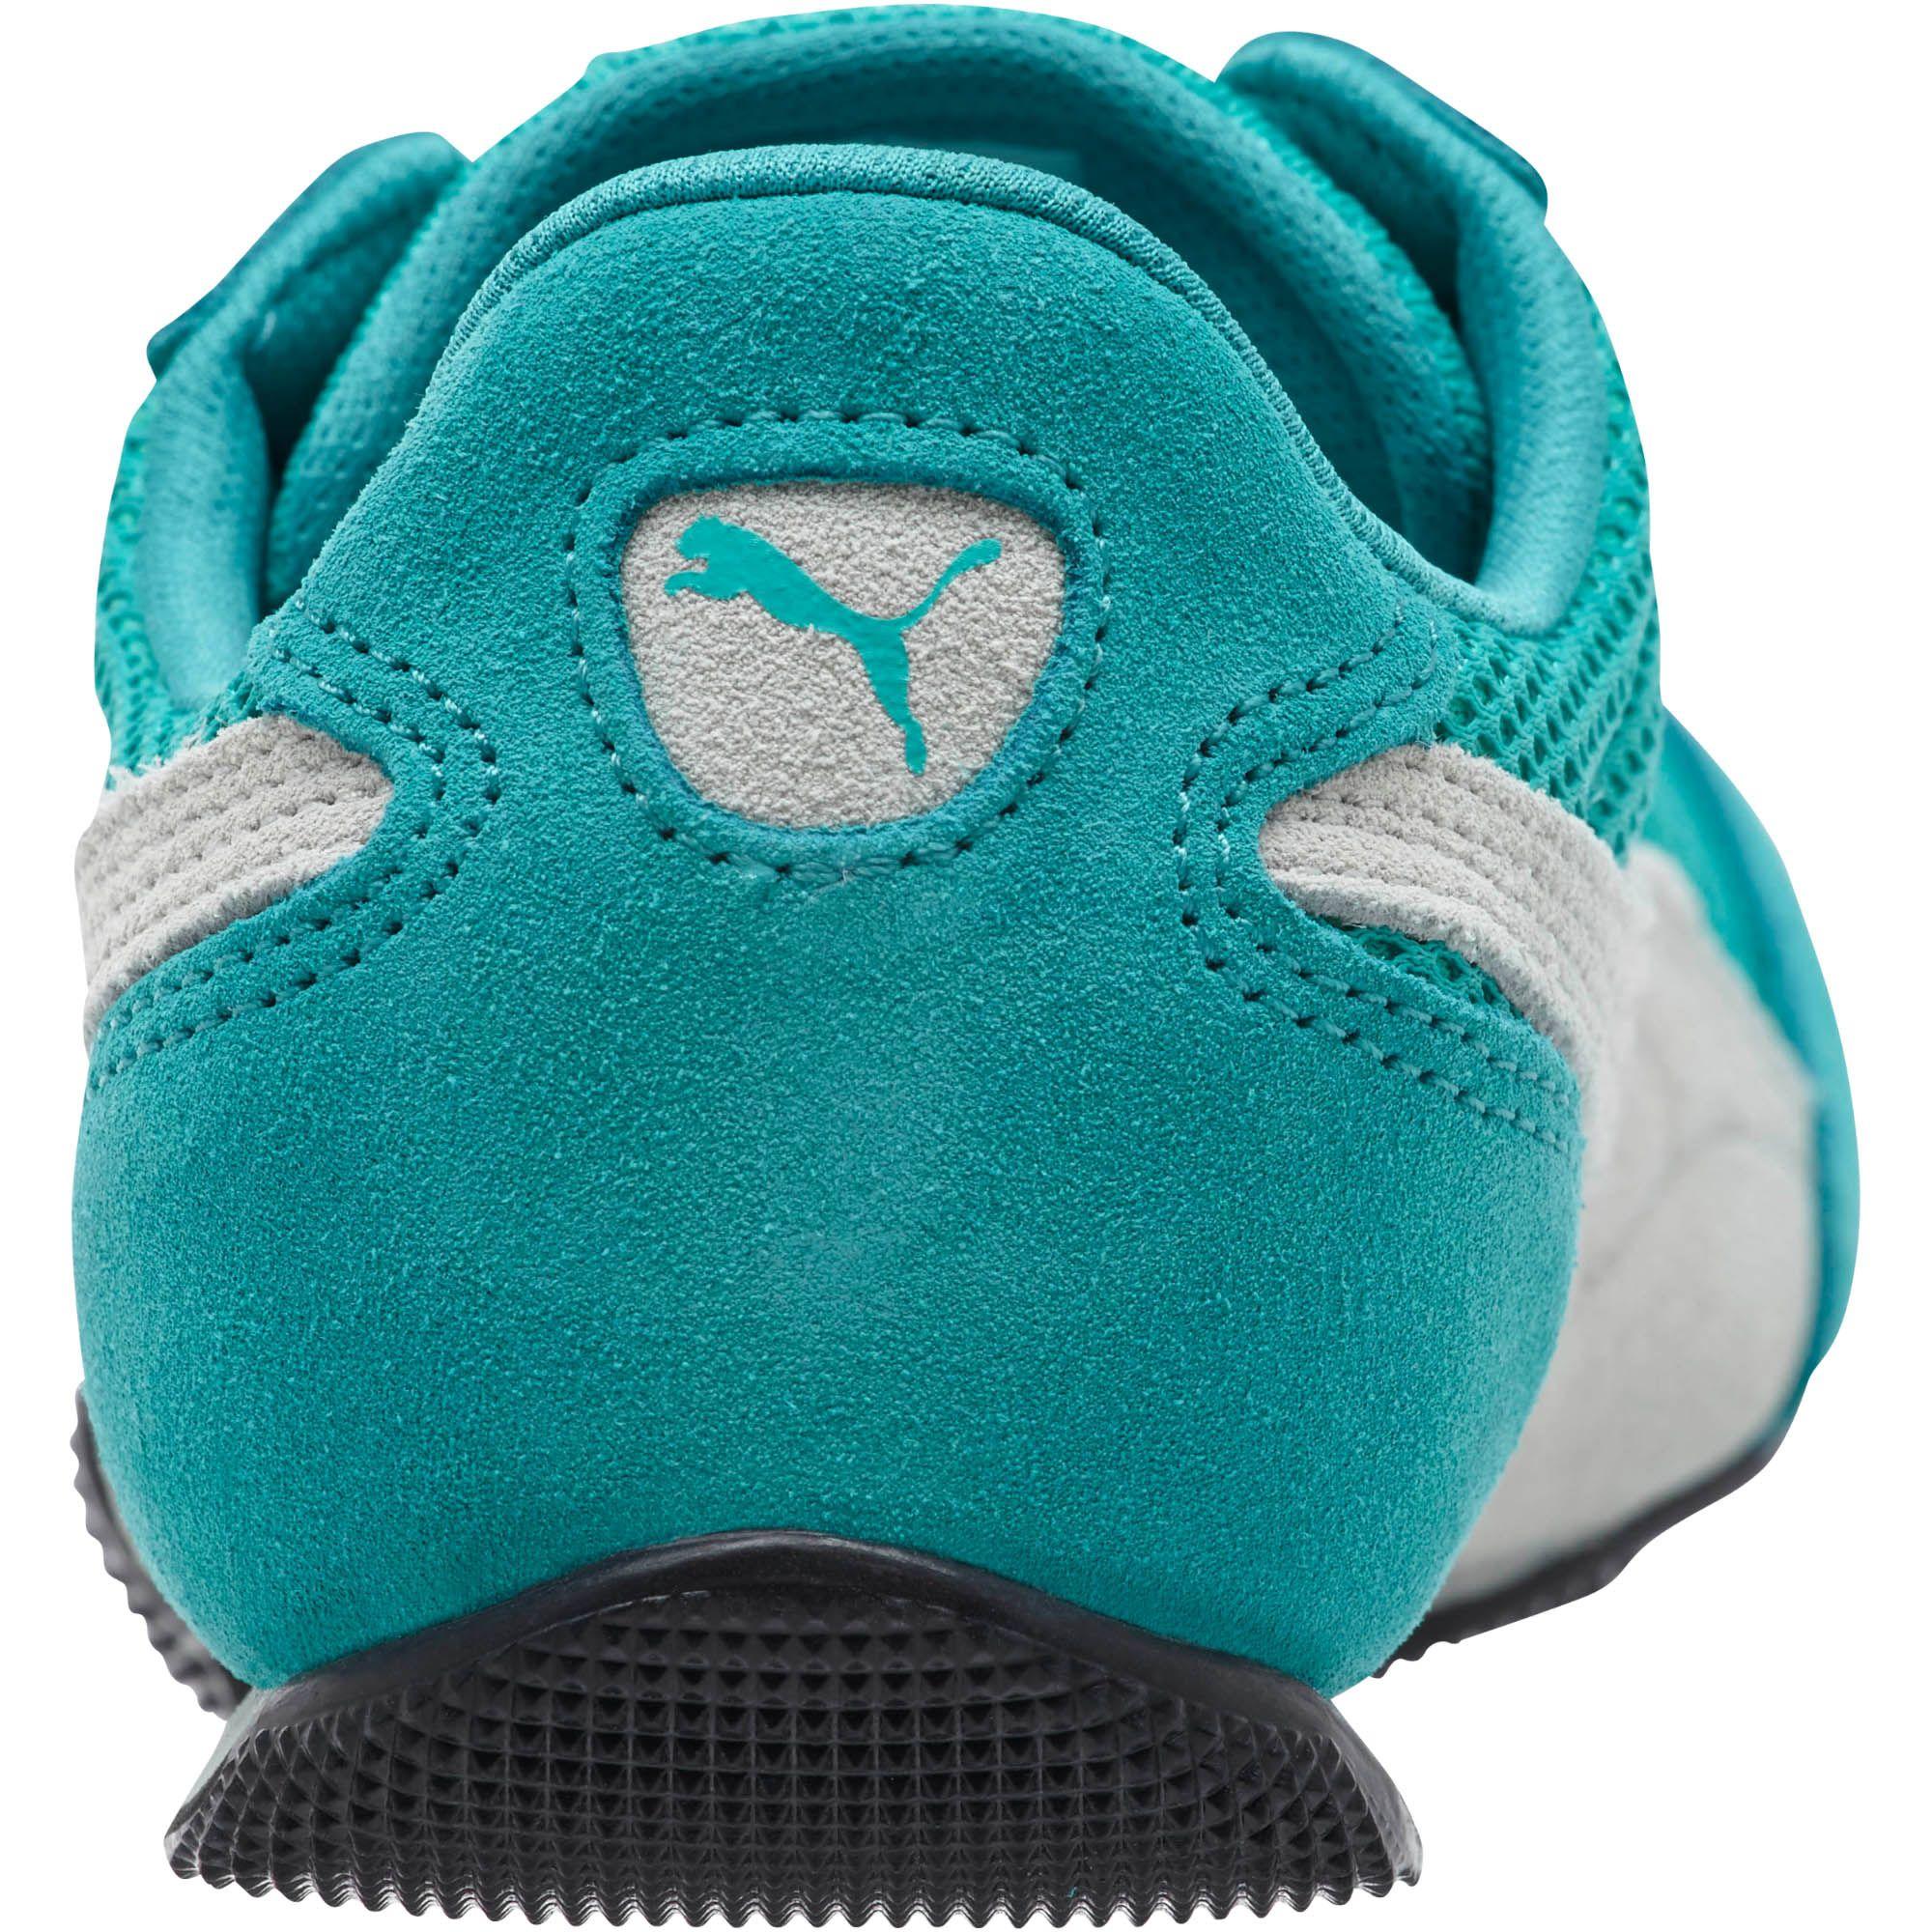 d30cc85d506 Lyst - PUMA 76 Runner Mesh Women s Sneakers in Blue